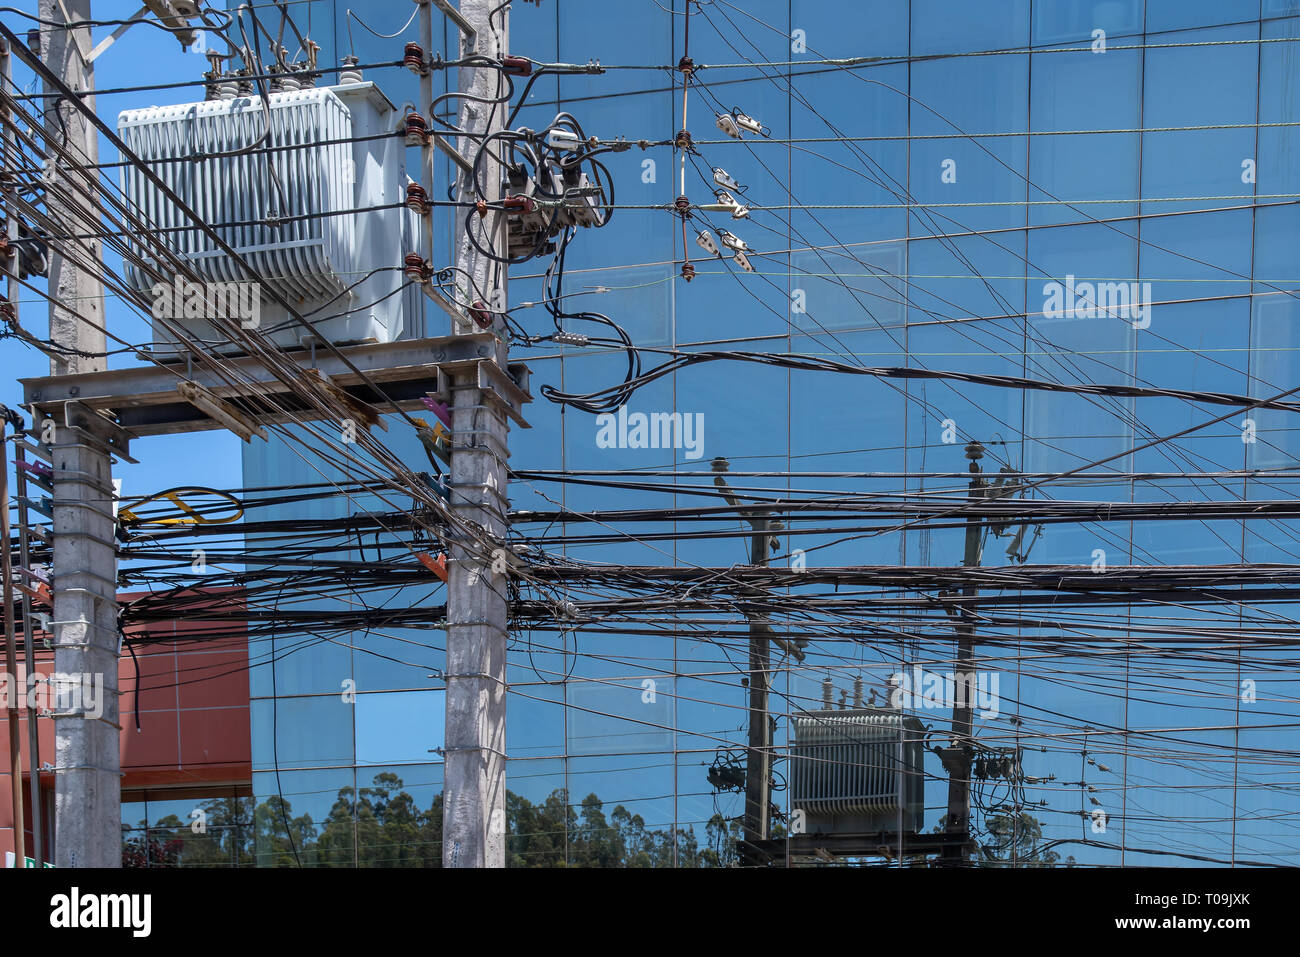 Stromversorgung in Concepcion, Chile. - Stock Image